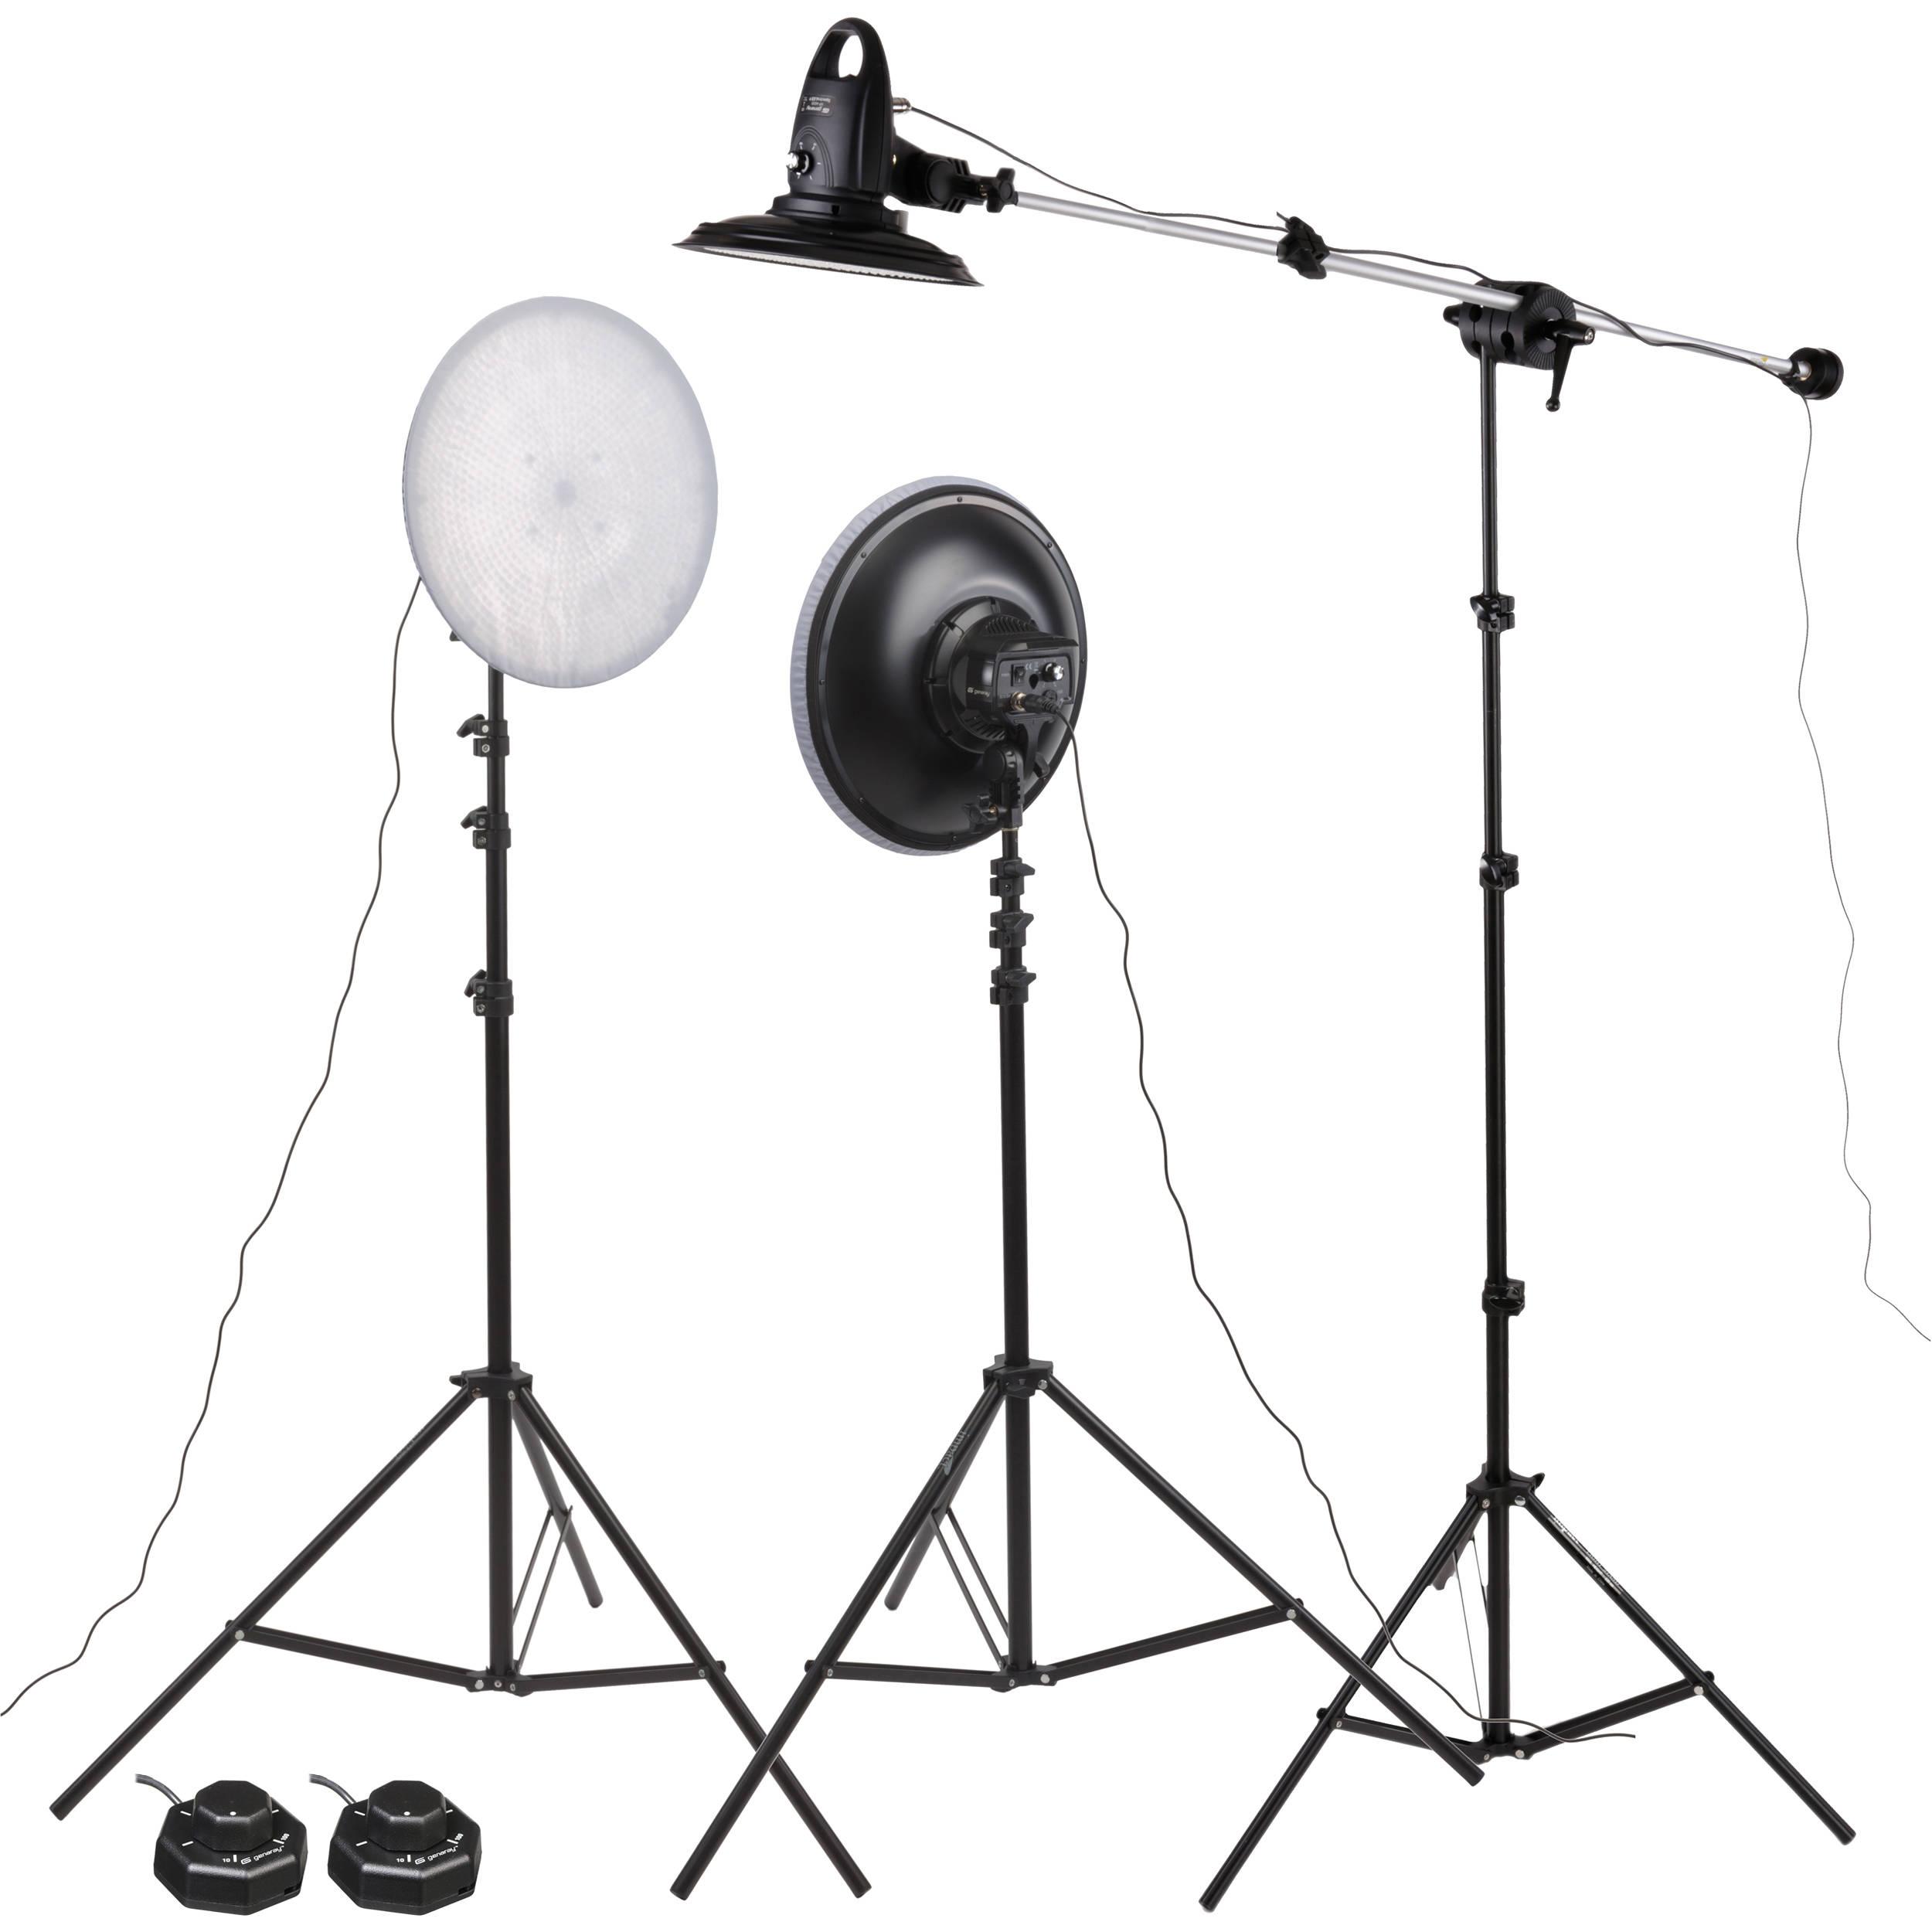 Genaray Spectroled 14 Three Light Kit Sp Ad75 3kii Bh Photo How To Build 120 Vac Lamp Dimmer 12 Vdc